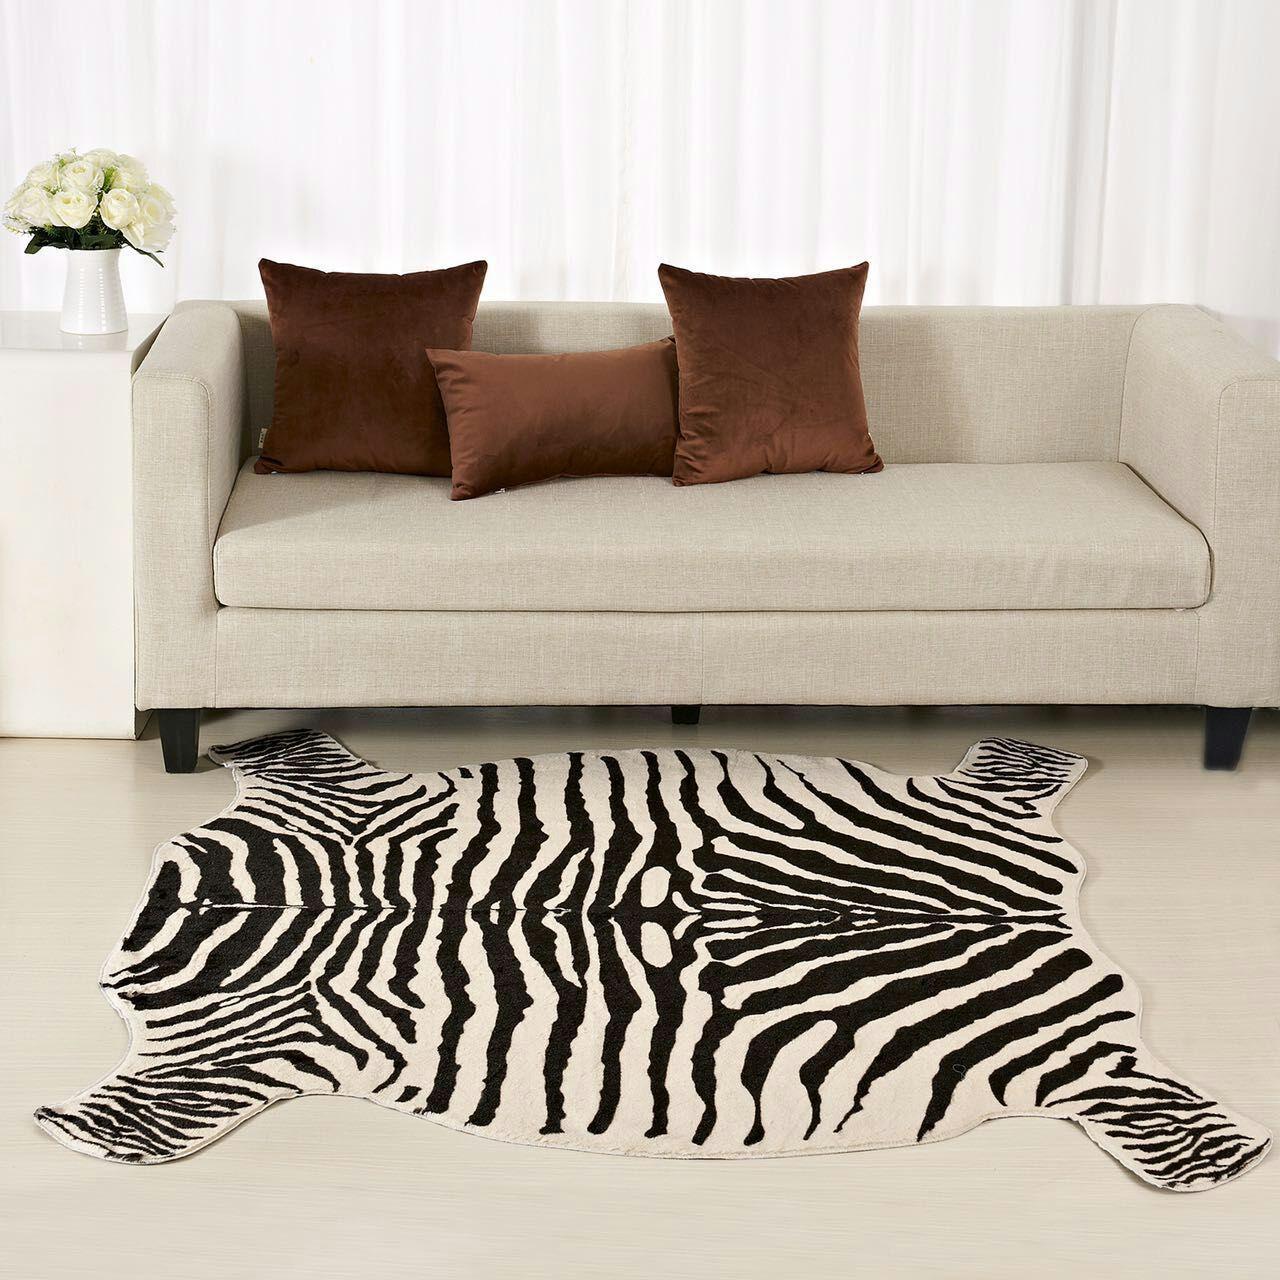 YUSHIMEI Zebra/Cow Printed Carpet PV Velvet Imitation